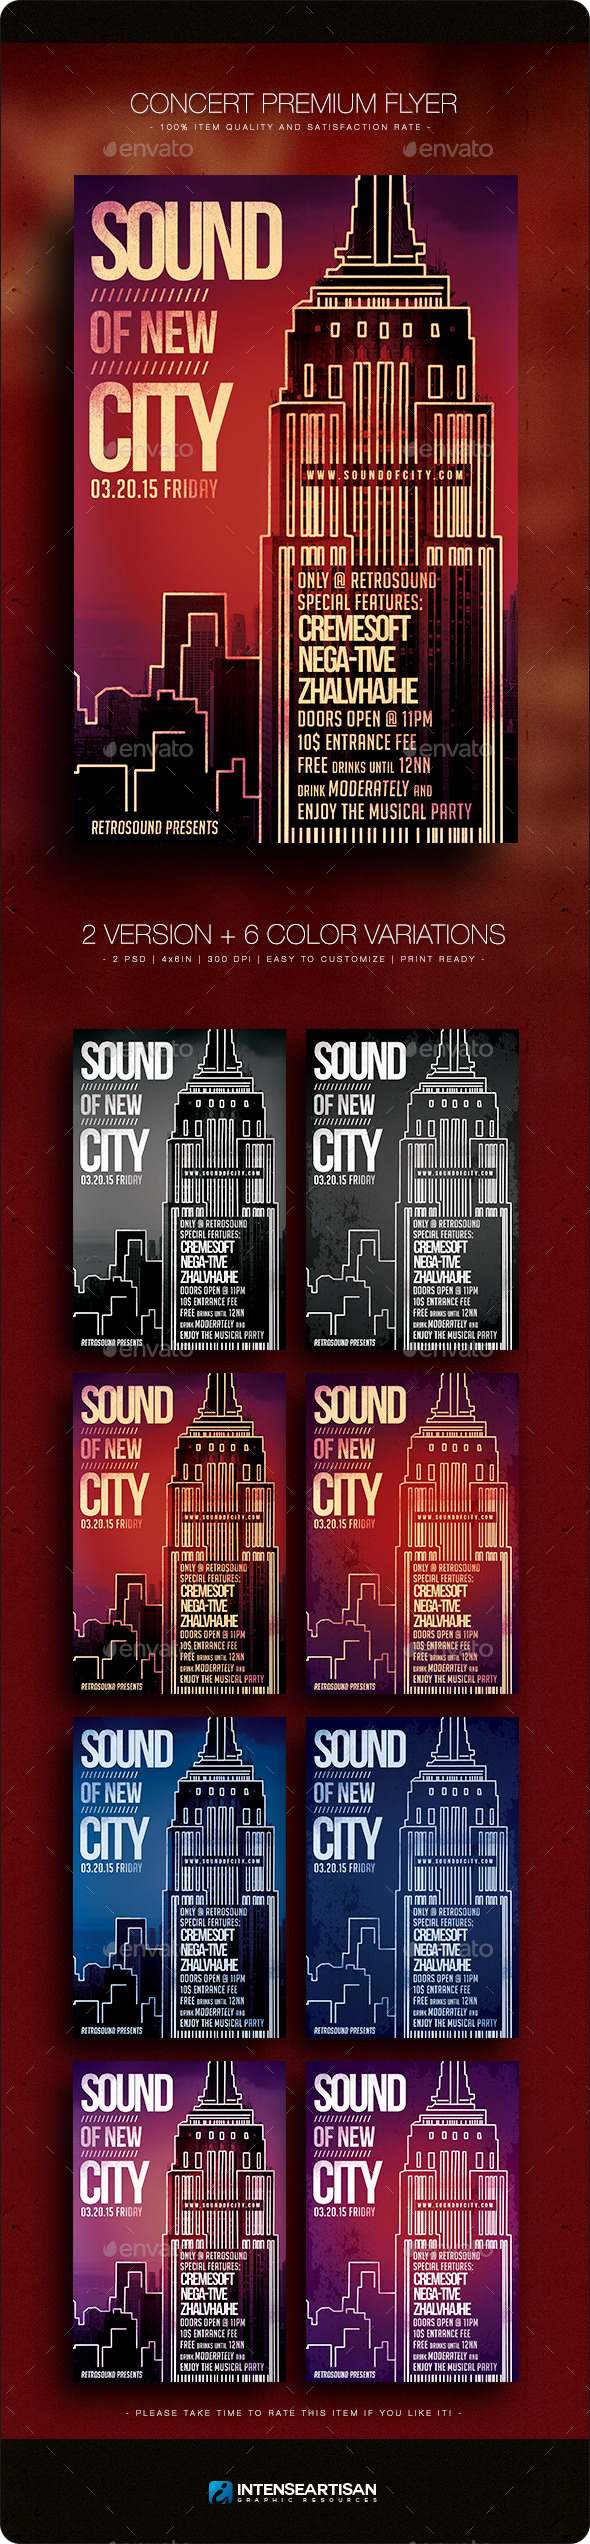 GraphicRiver Concert Premium Flyer V.6 10786050